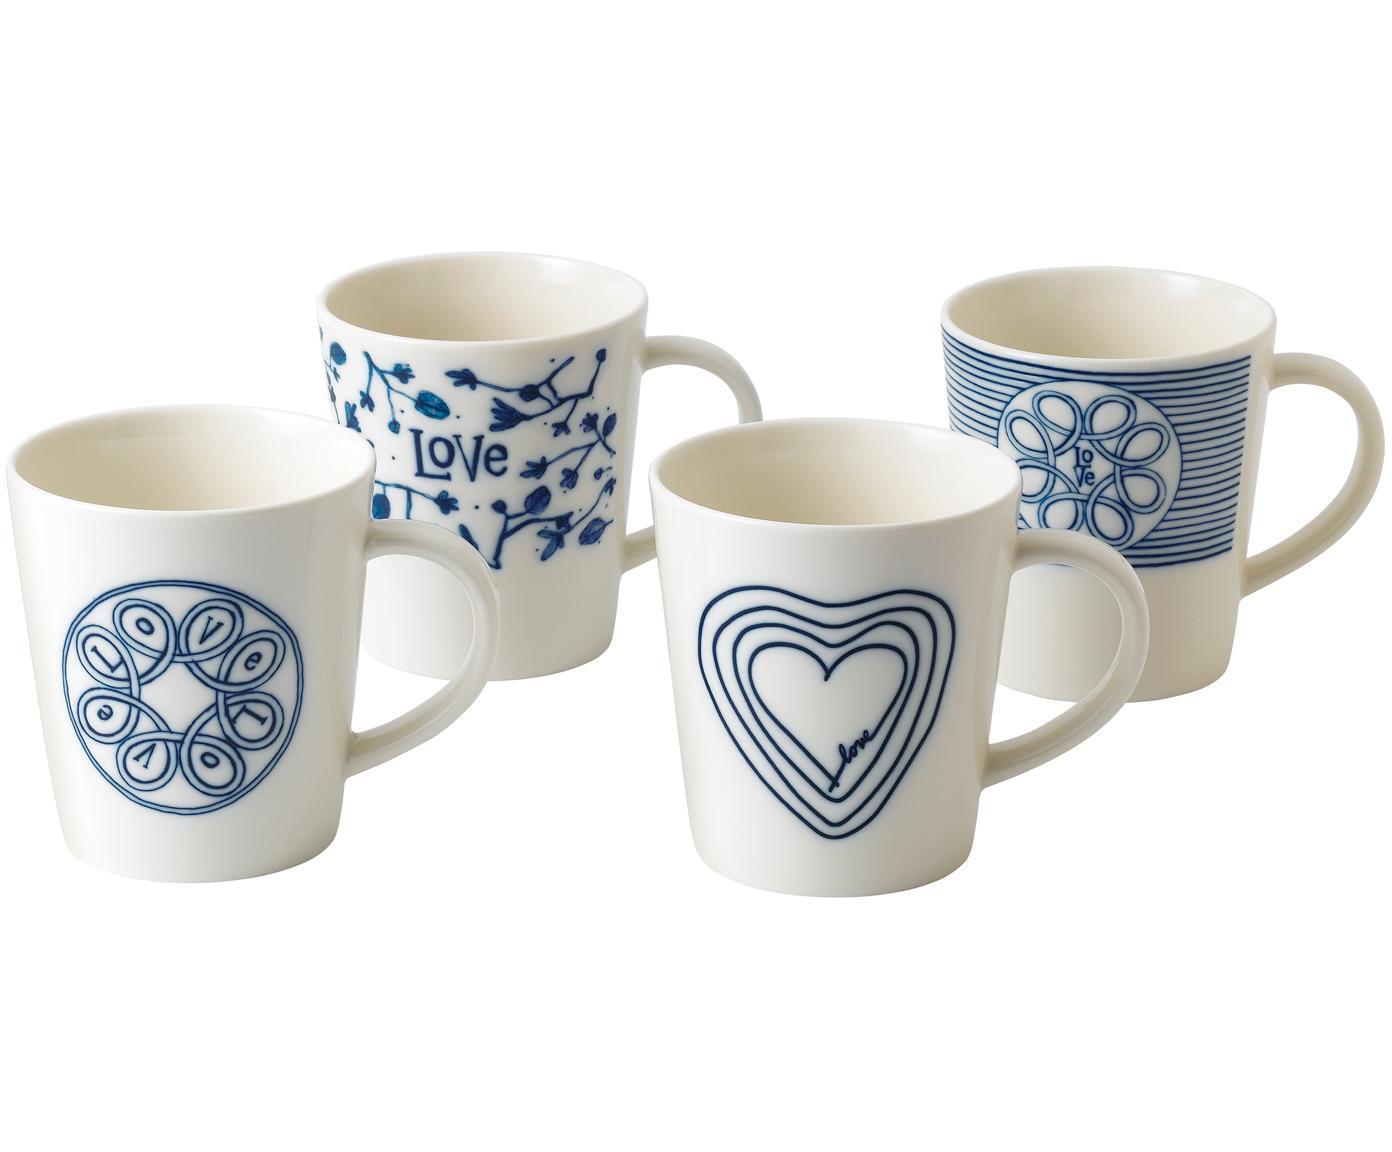 Set tazze Love,  4 pz., Porcellana, Avorio,  cobaltico, Ø 10 x A 11 cm